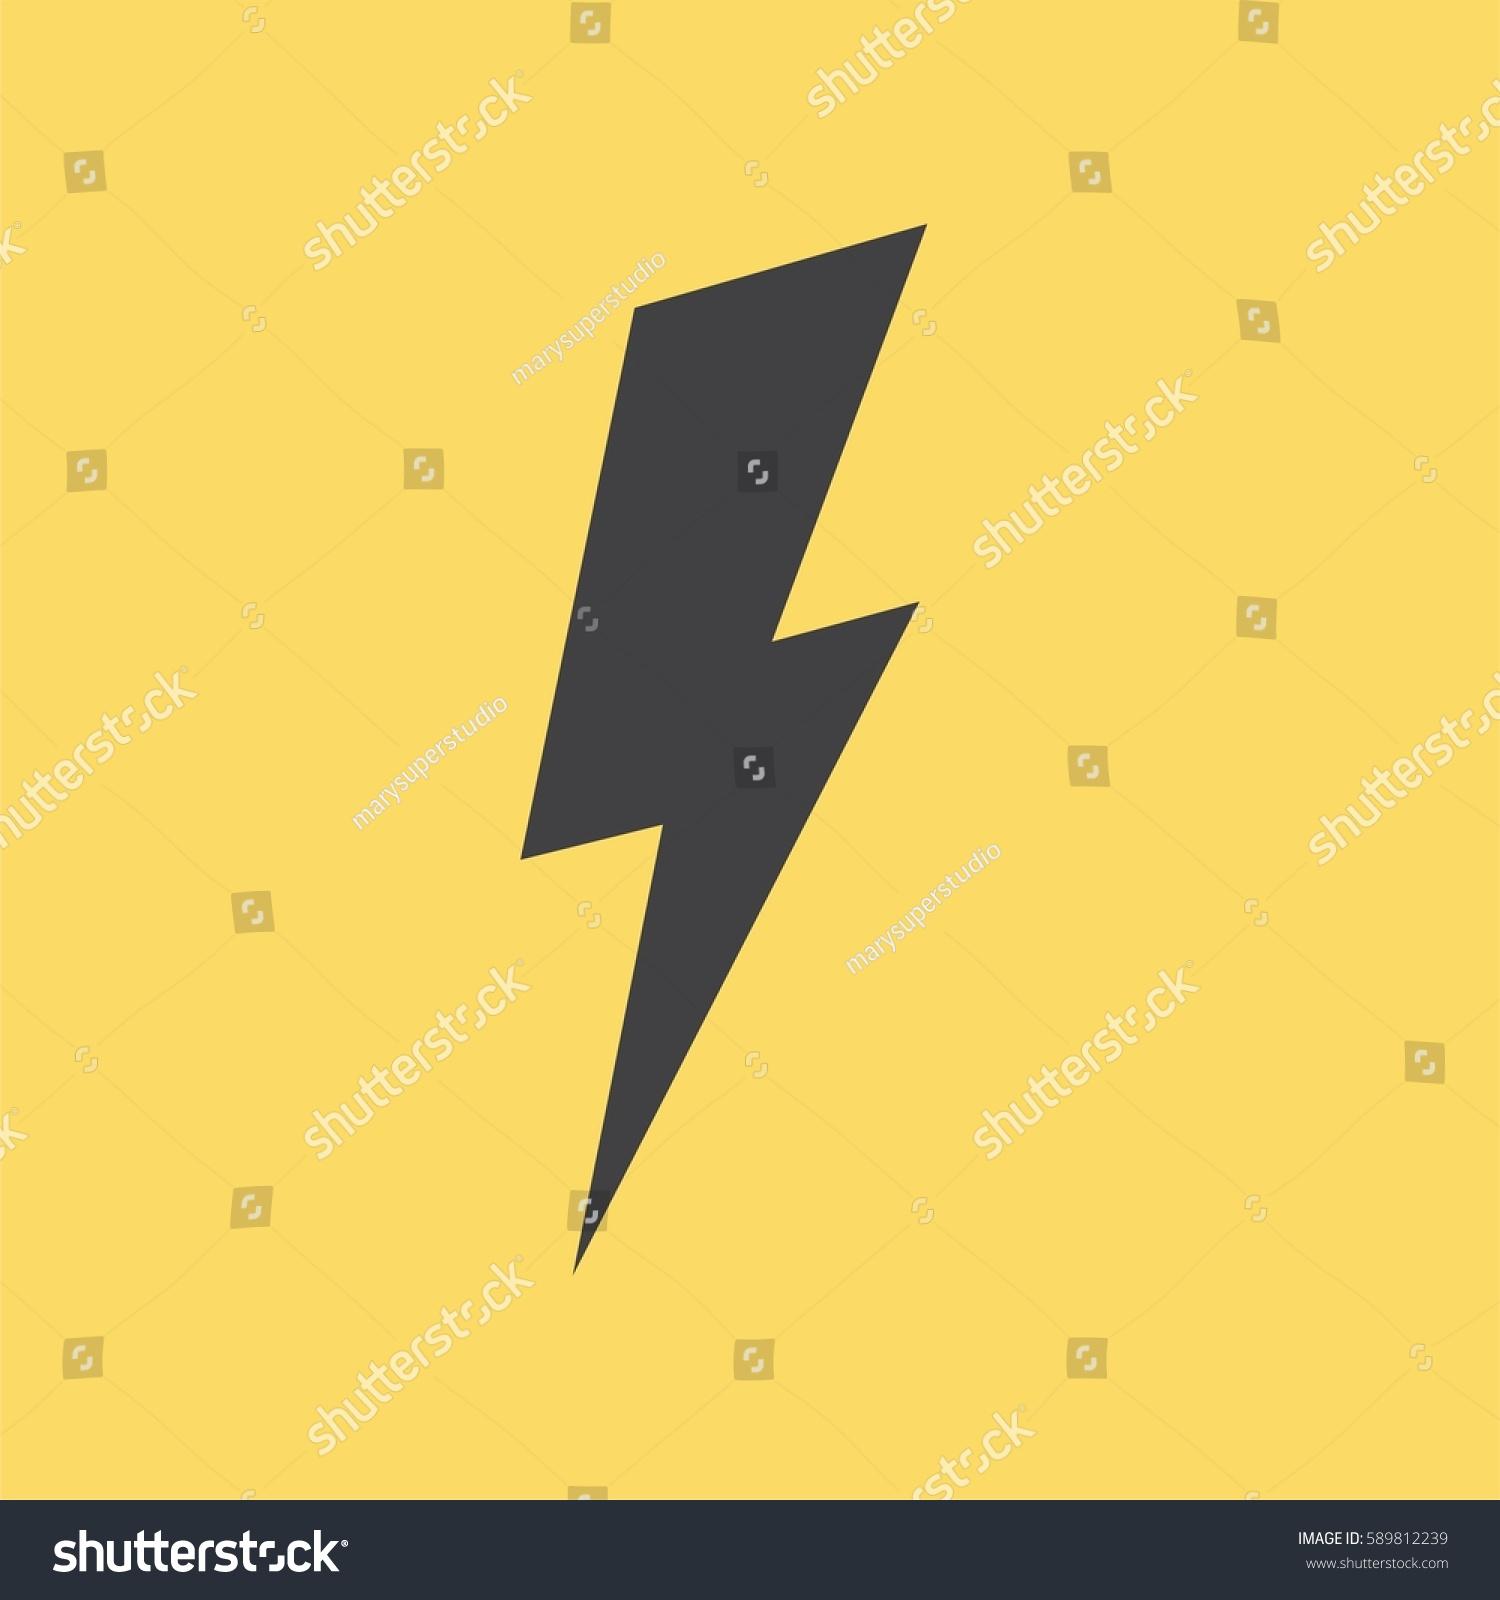 Set Yellow Thunderbolt Symbols Vector Danger Stock Vector 589812239 ...